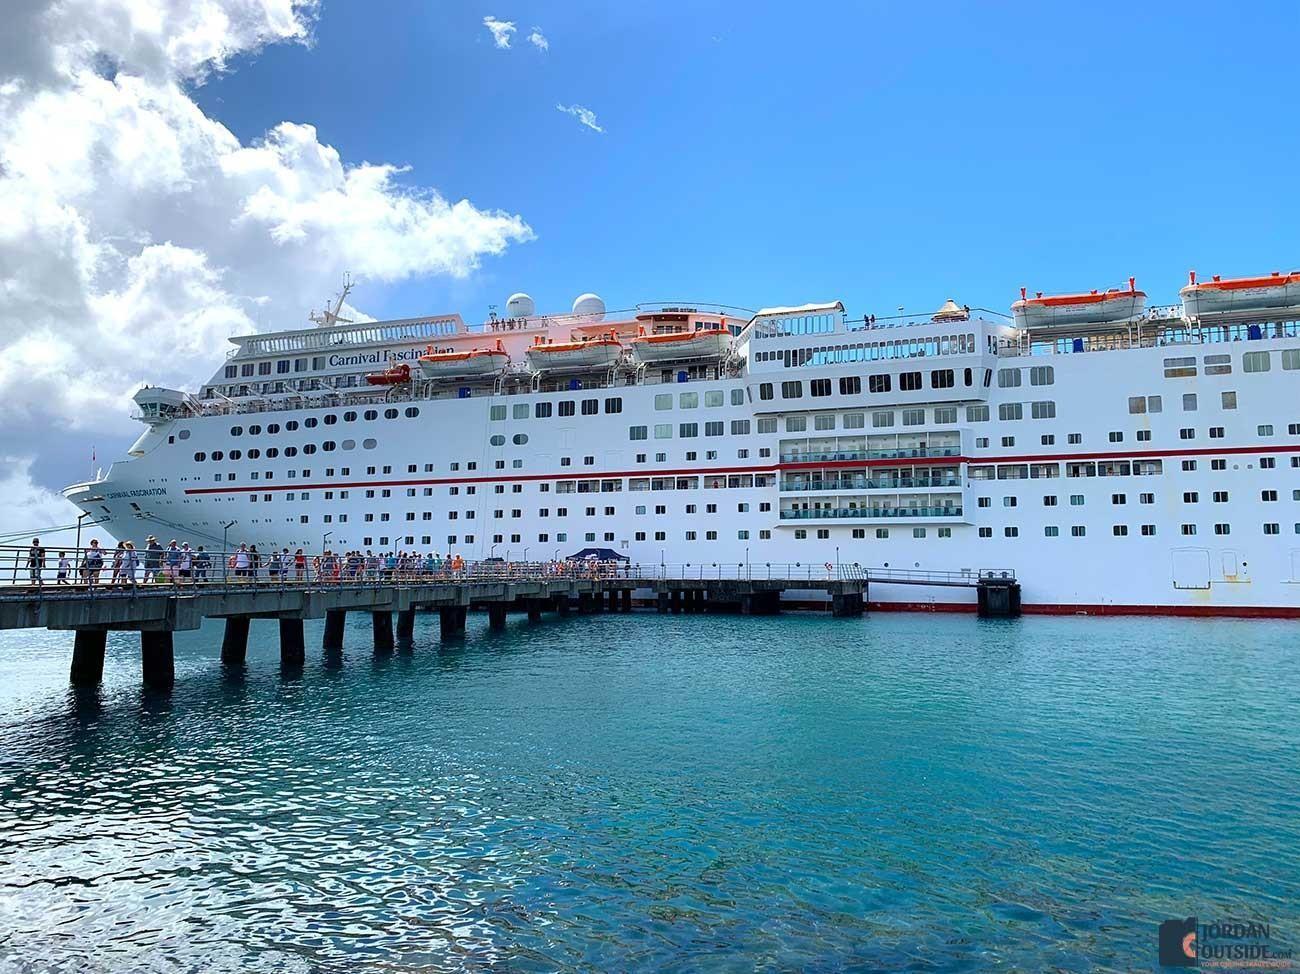 Carnival Cruise Ship at Dominica